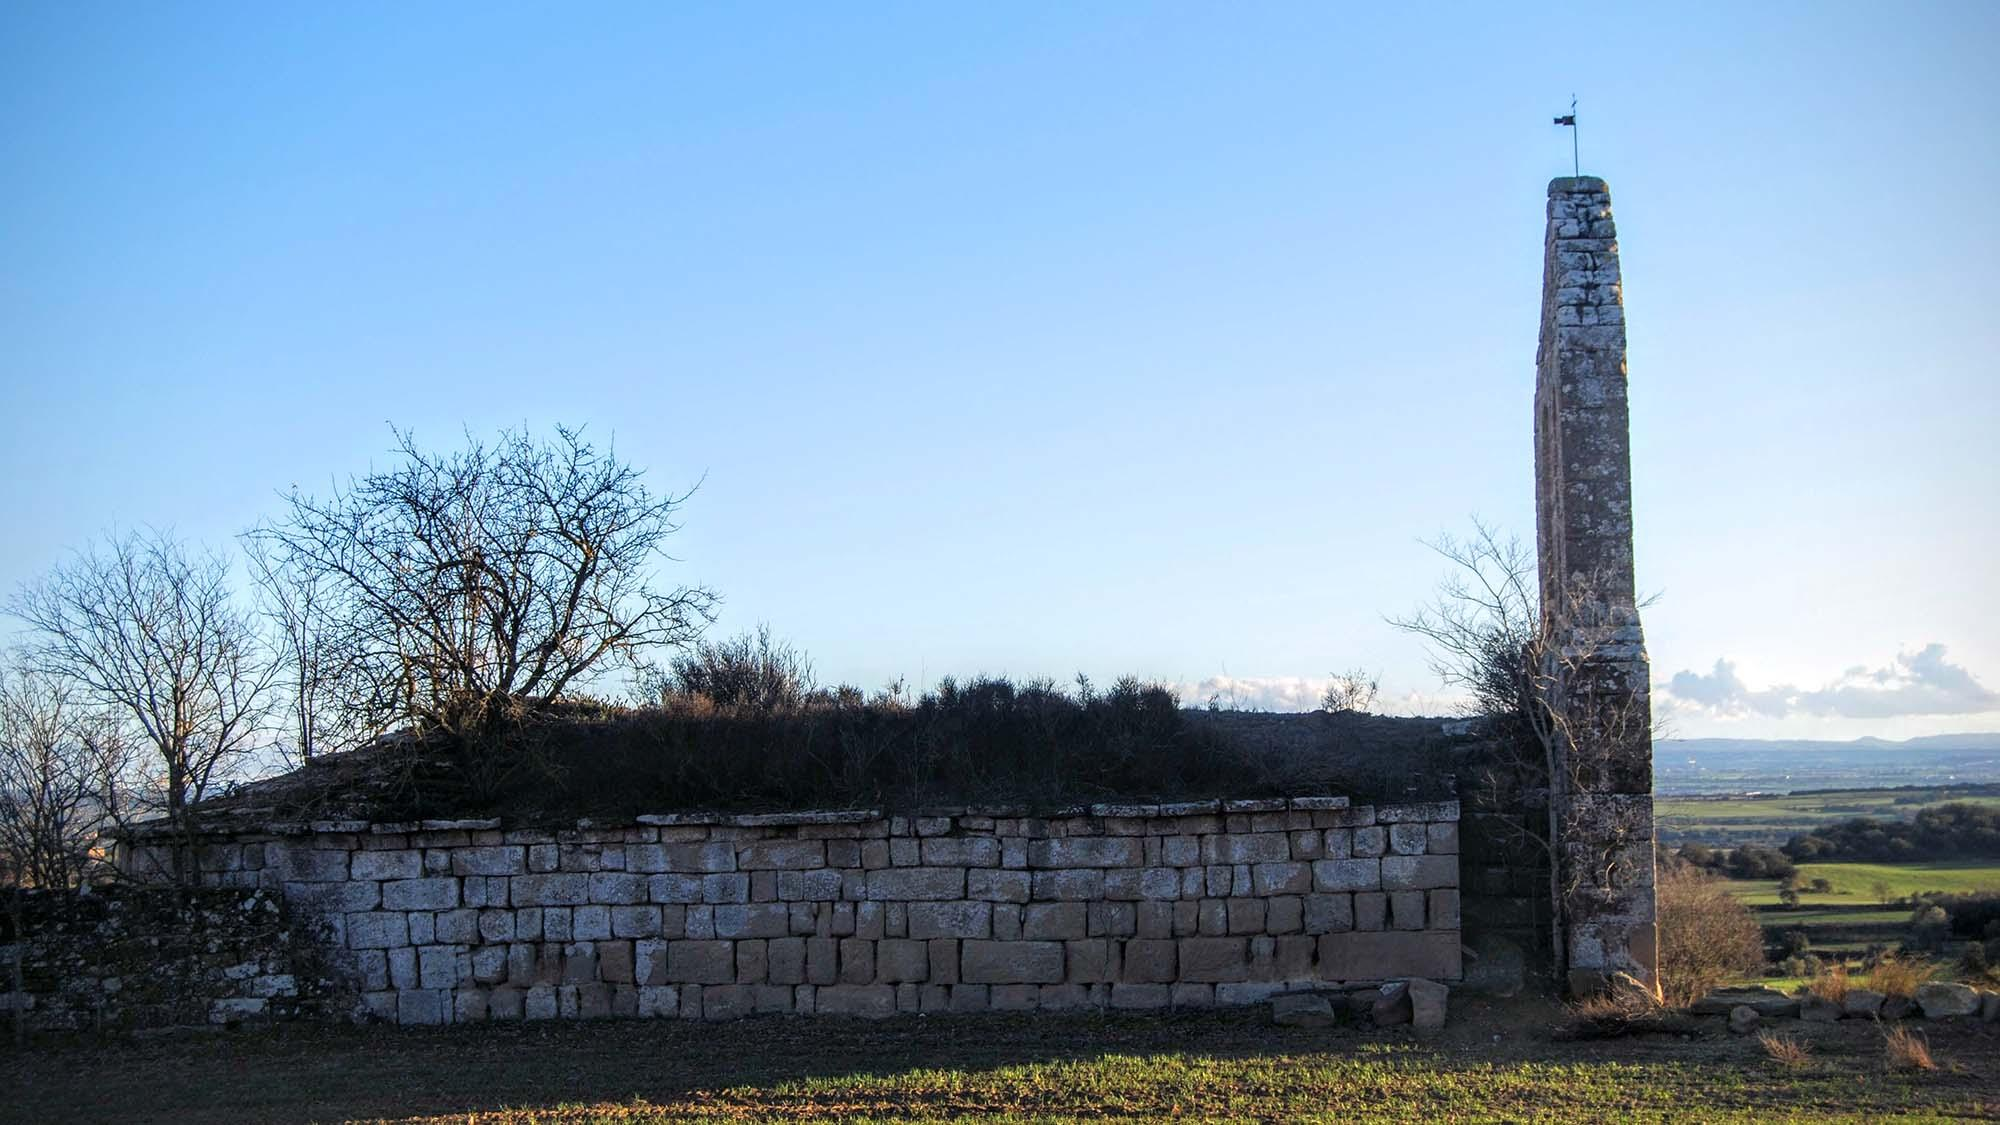 Església de Sant Pere de les Sitges